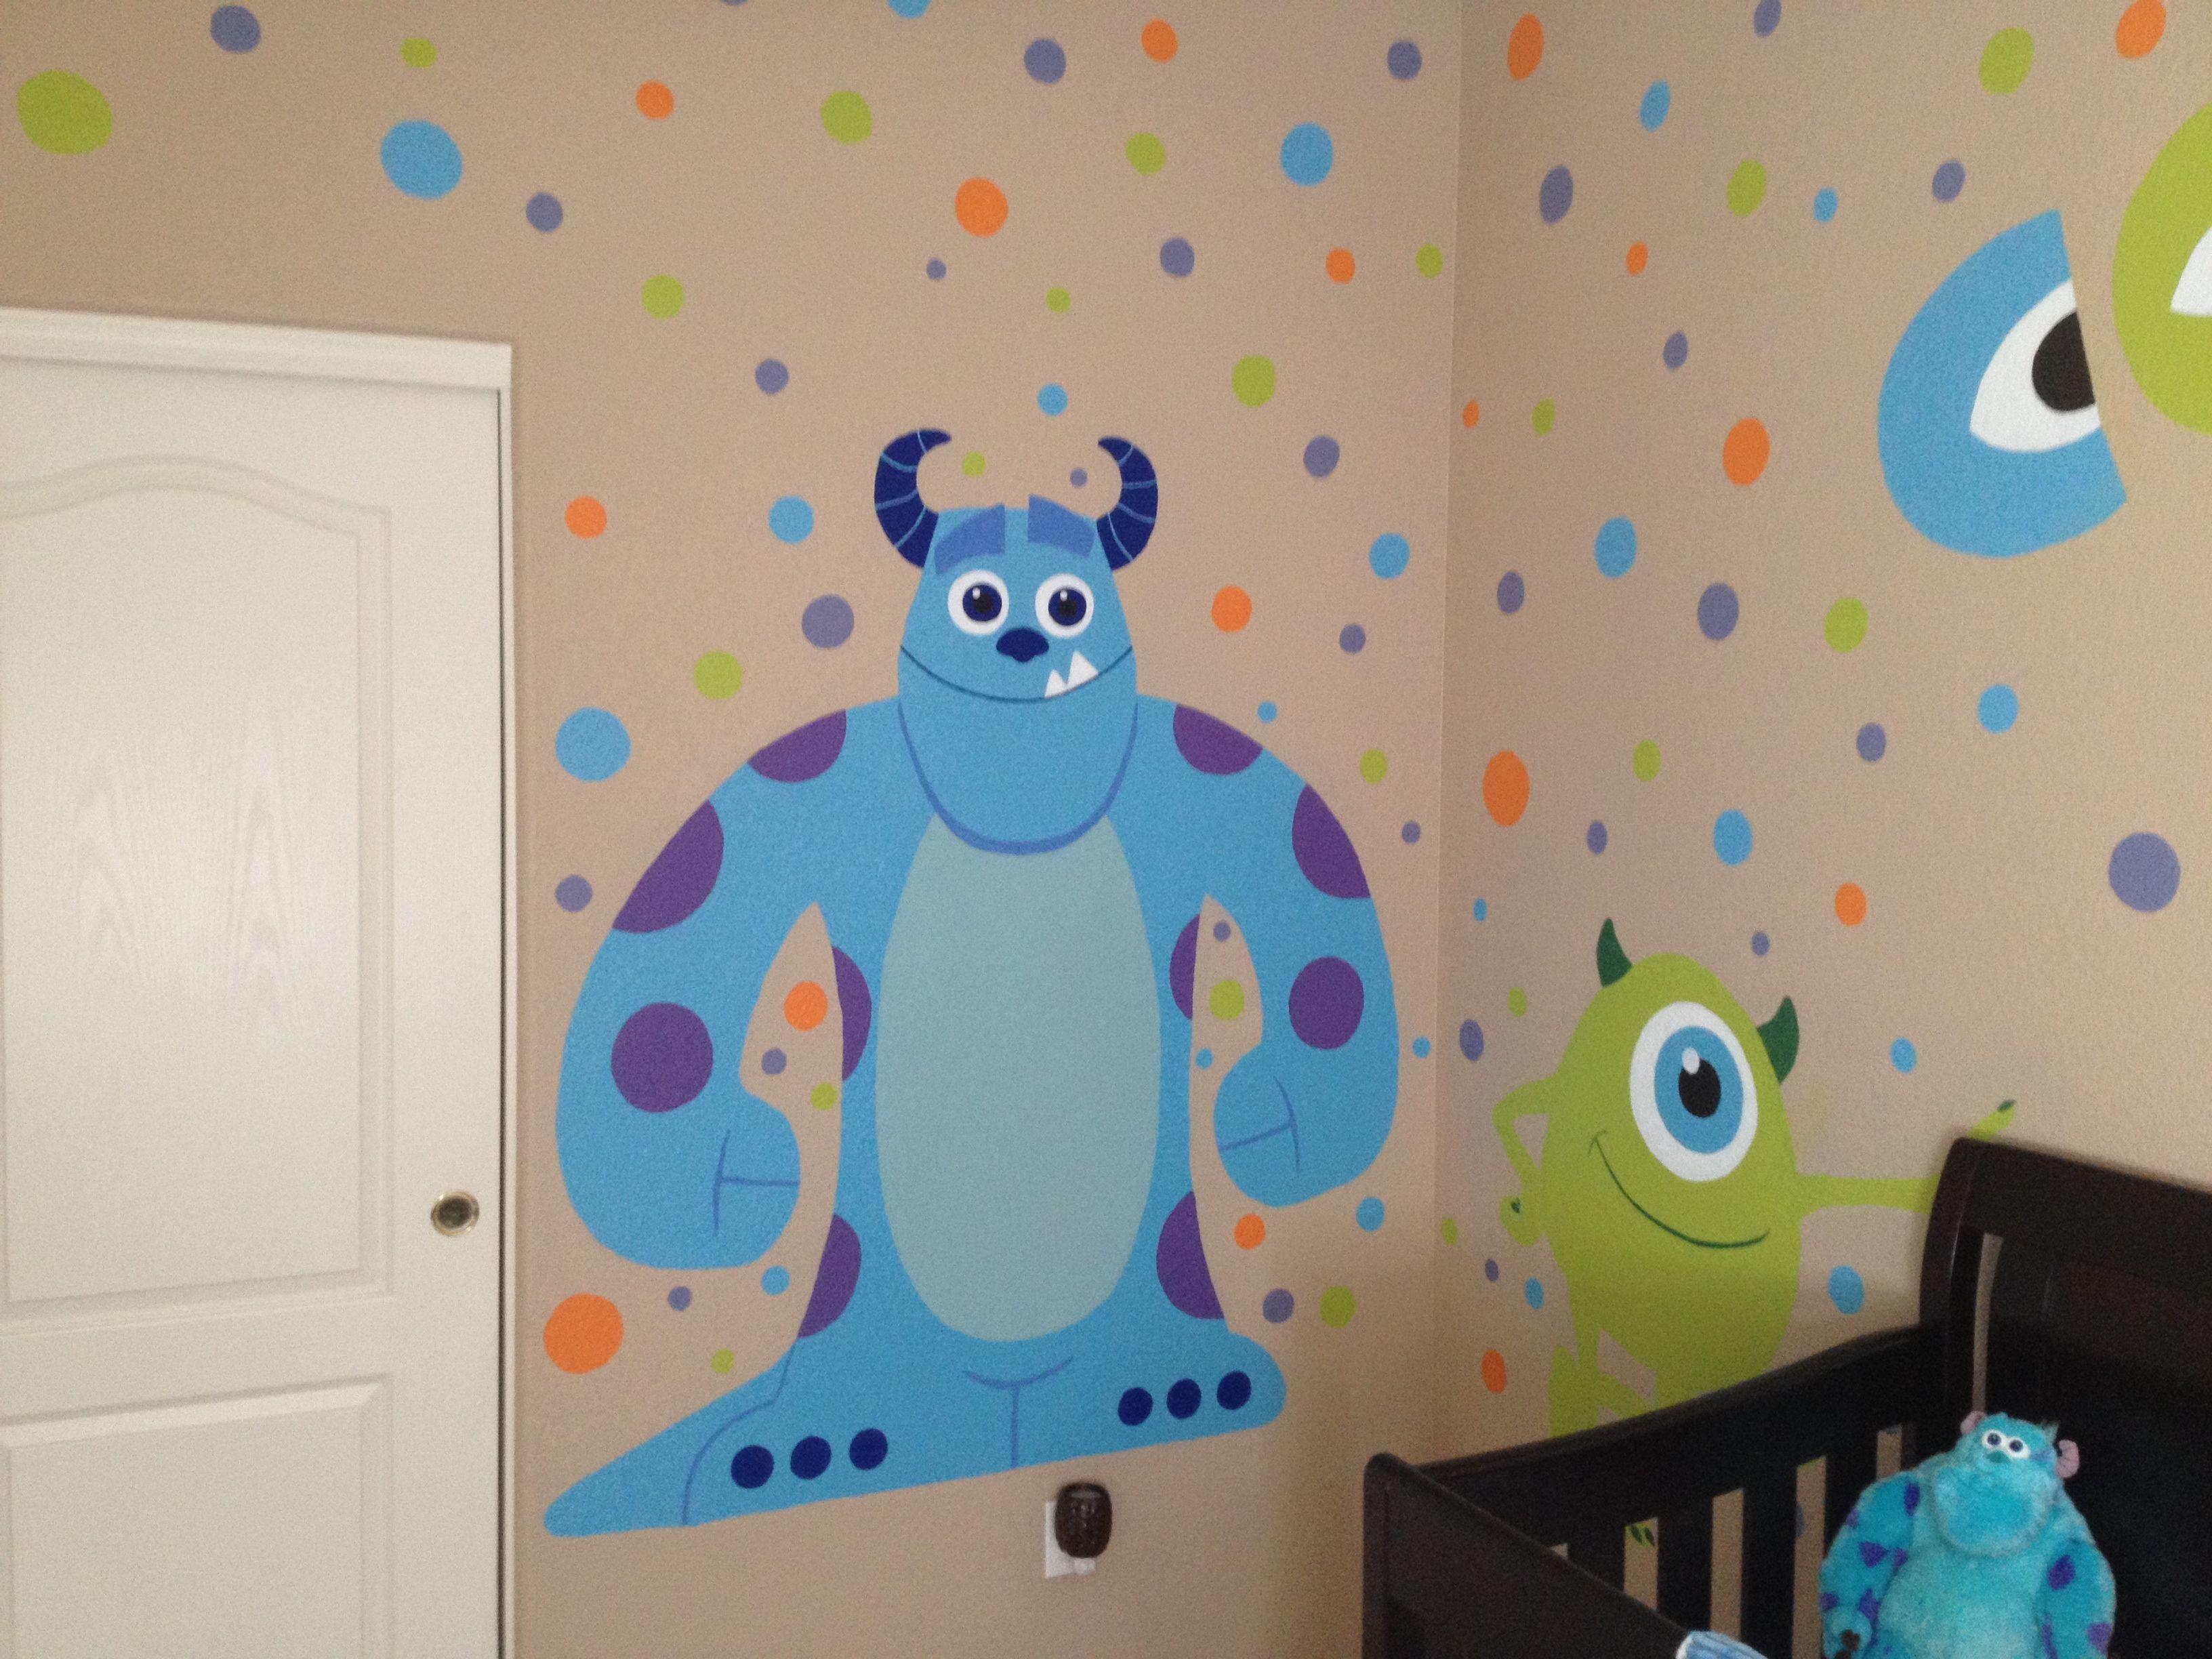 Pin By Jojo Dalton On Monster S Inc Baby Room Disney Baby Rooms Baby Boy Room Decor Monsters Inc Baby